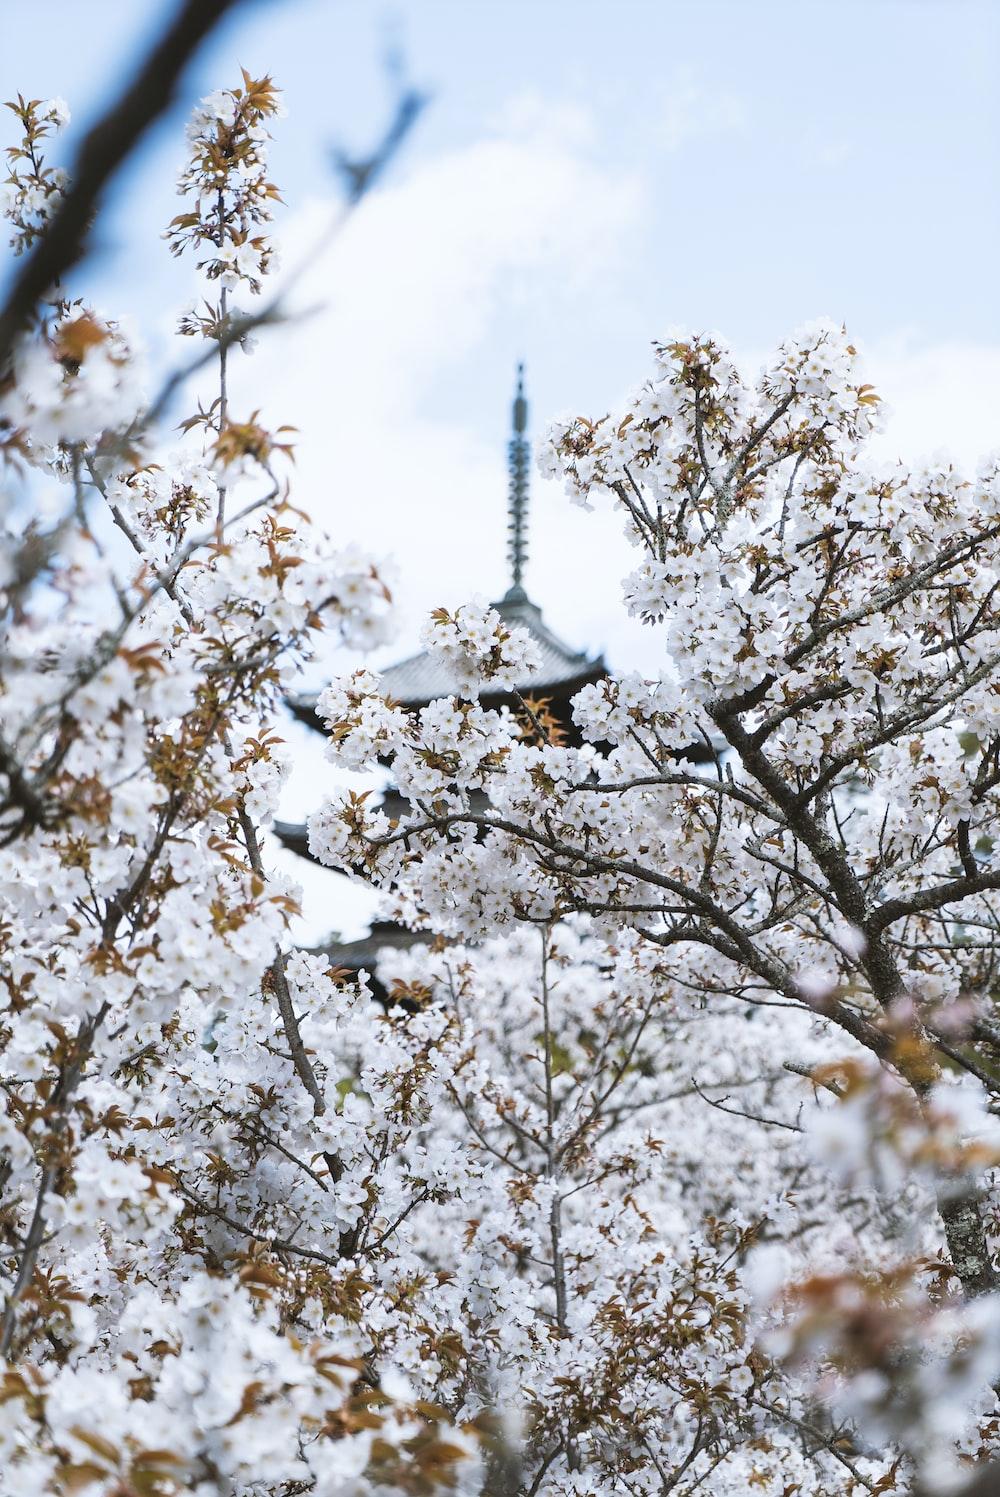 white cherry blossom tree under blue sky during daytime